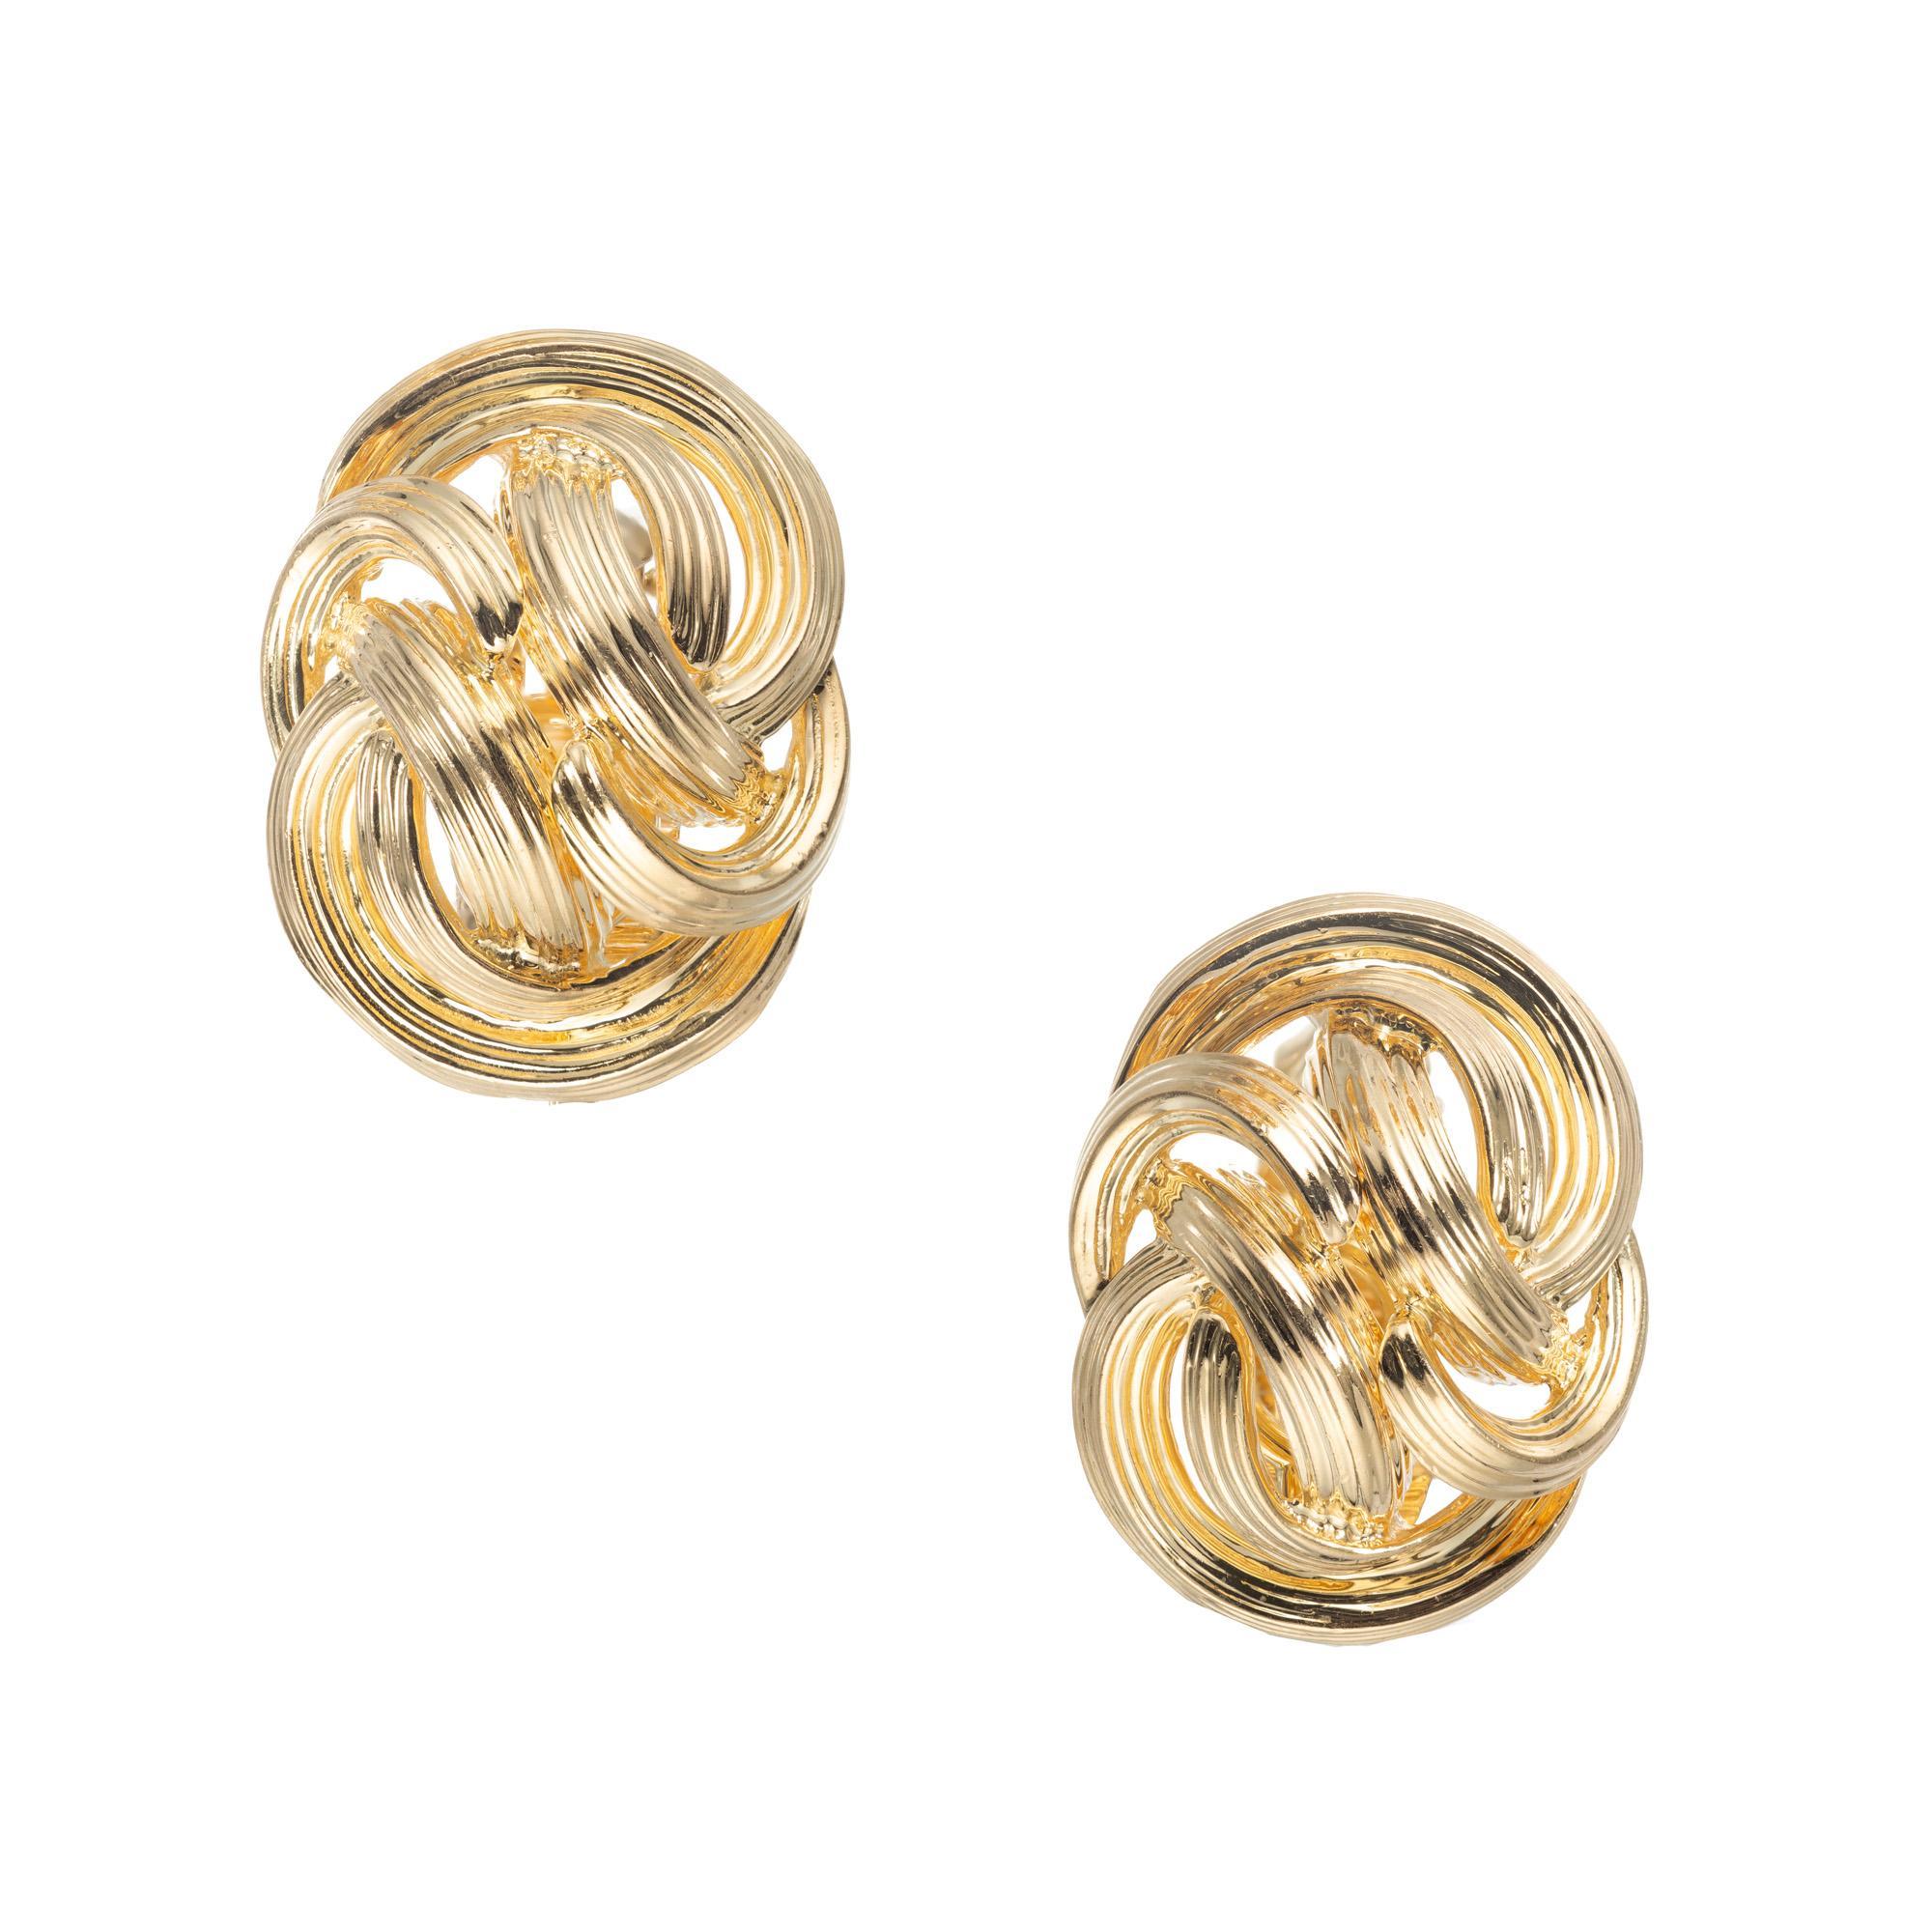 c8beb3adb Tiffany & Co. Stud Earrings - 46 For Sale at 1stdibs